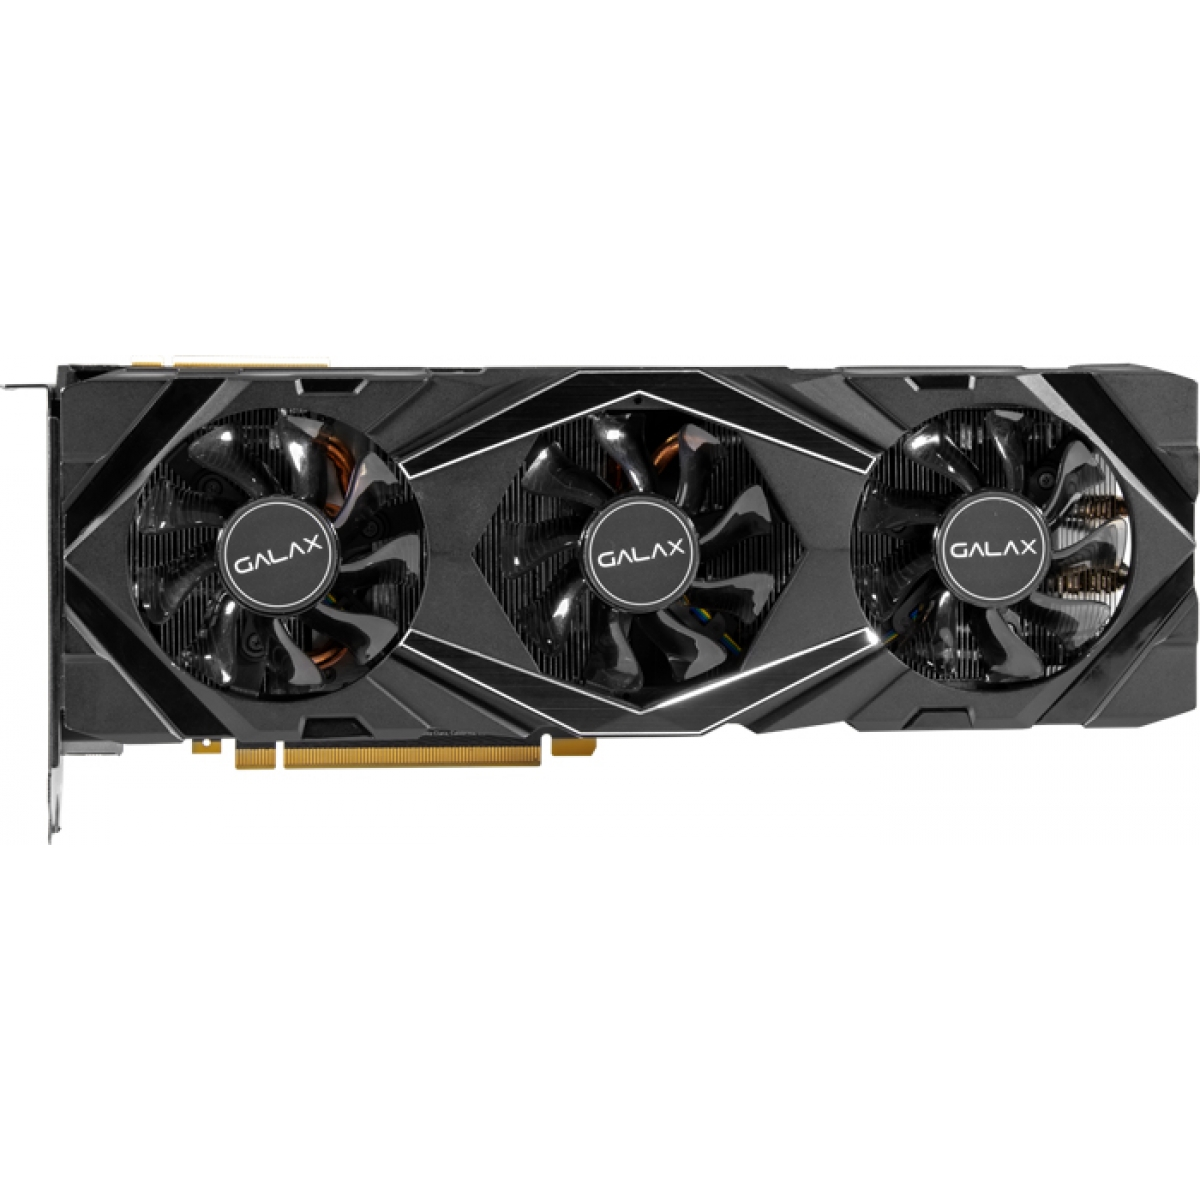 Placa de Vídeo Galax Geforce RTX 2080 Ti SG (1-Click OC), 11GB GDDR6, 352Bit, 28IULBMDT22G